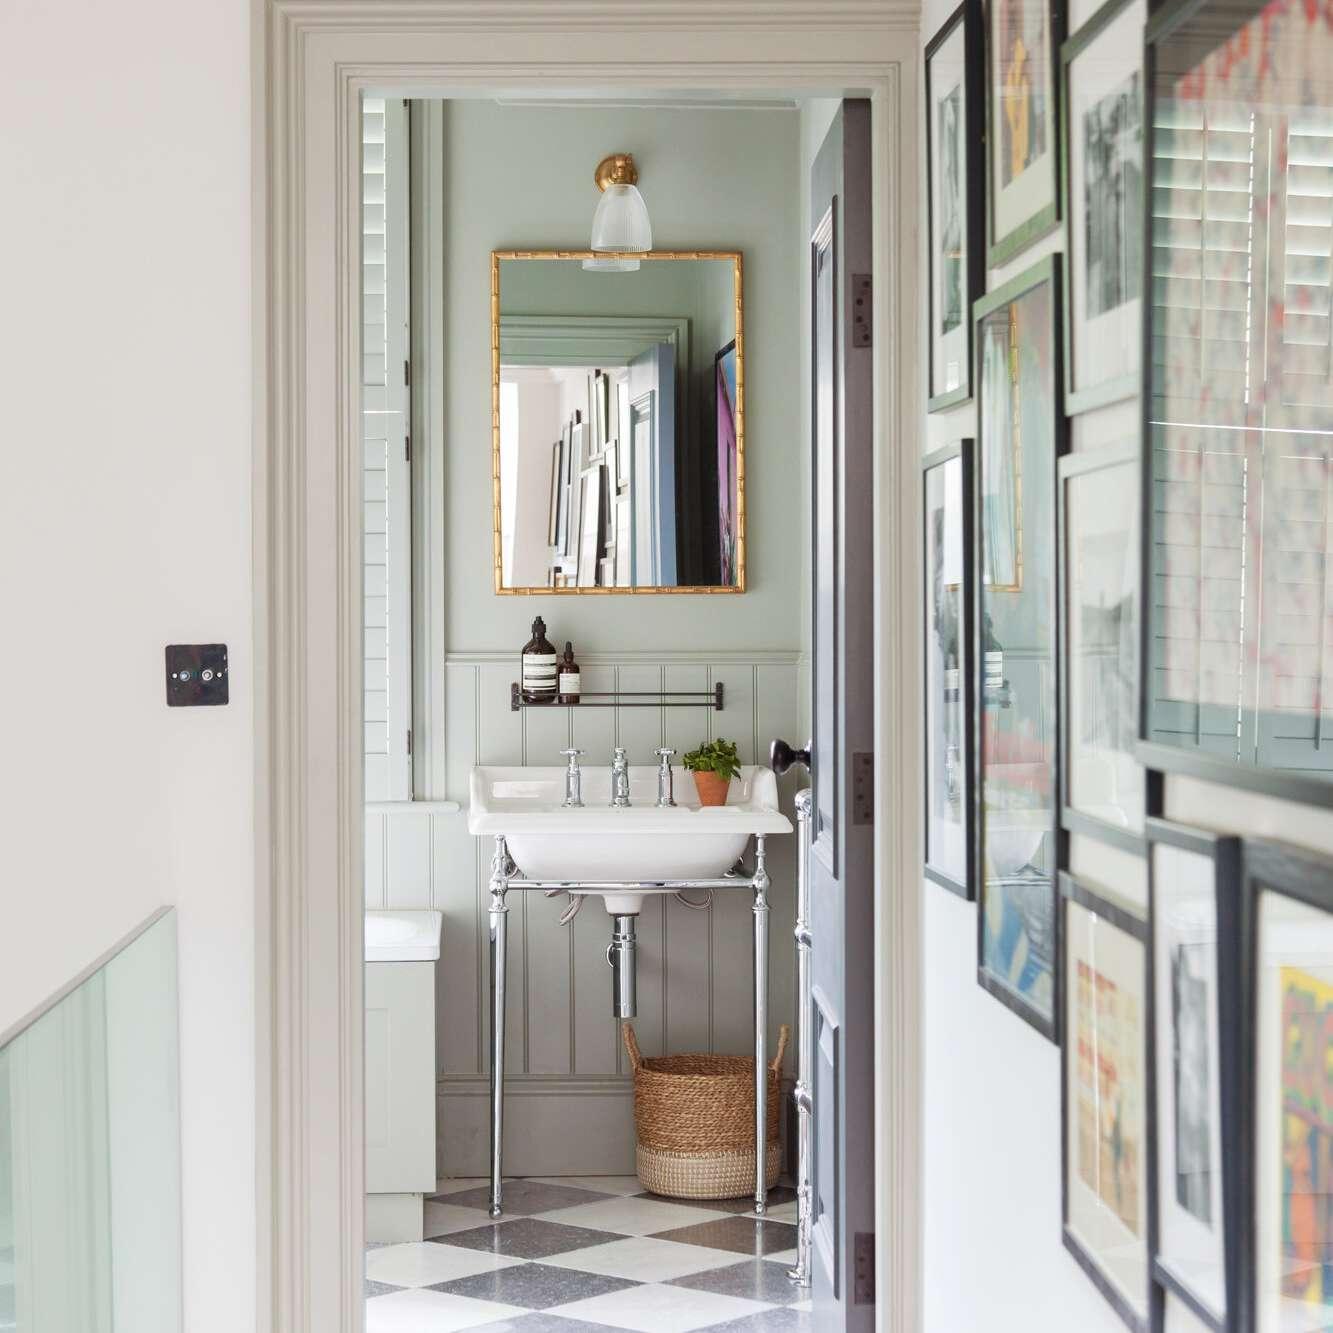 A mint bathroom, viewed from a hallway